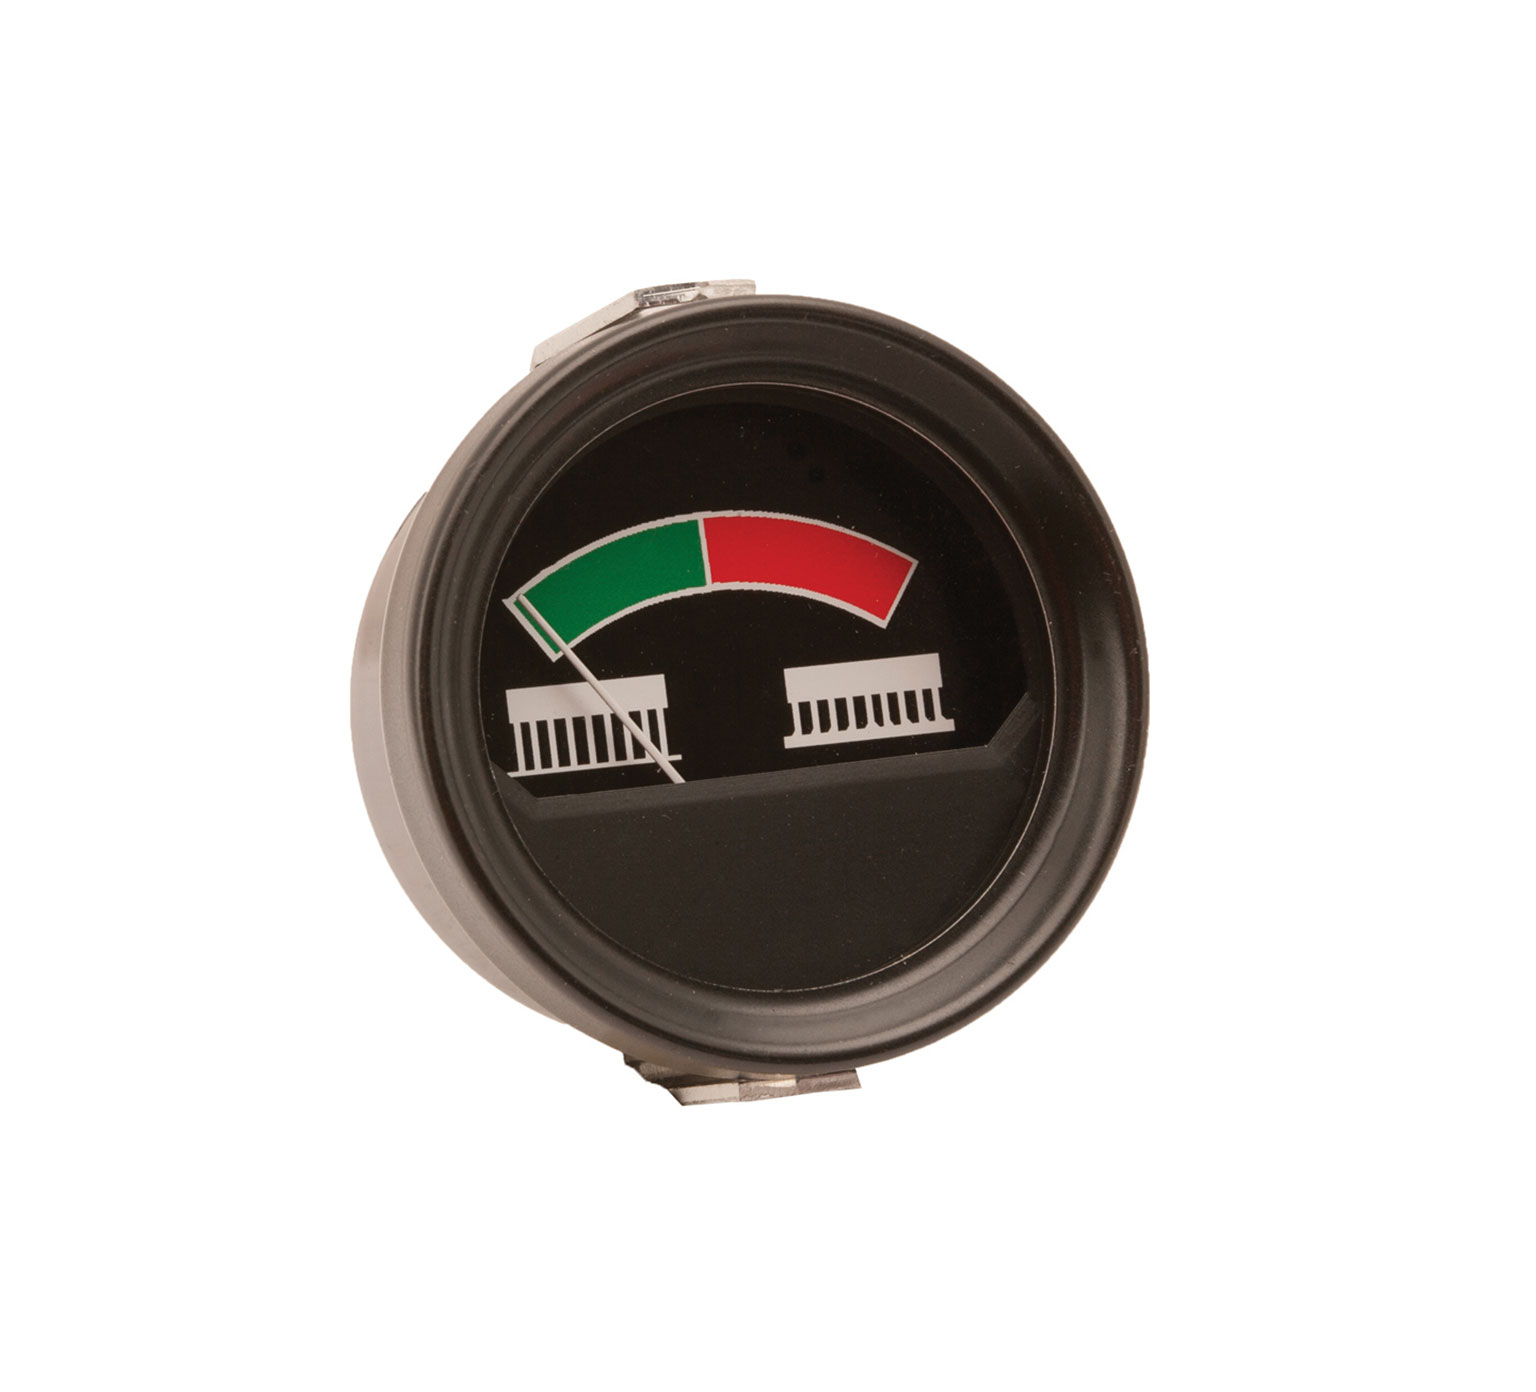 Tennanttrue Brush Press Gauge Pn 1041318